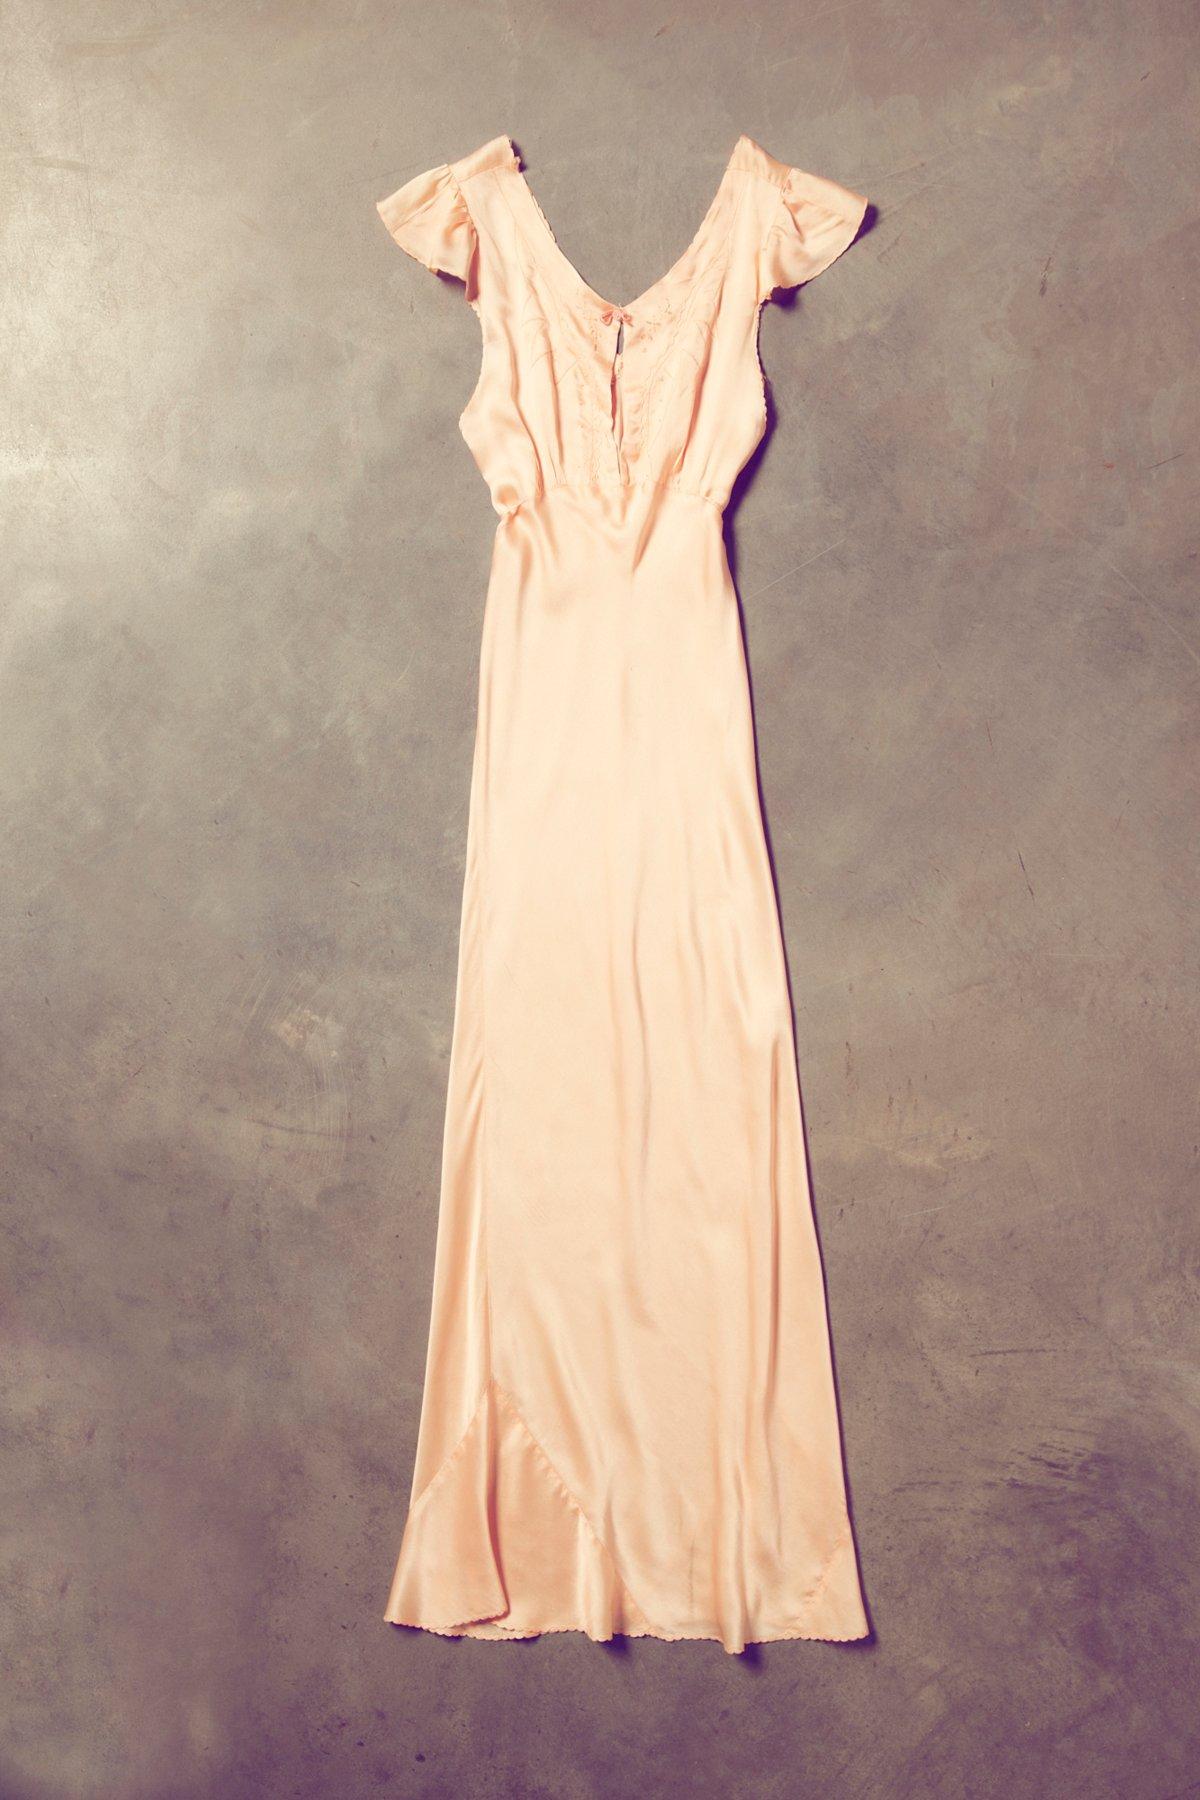 Vintage Capped Sleeve Lace Slip